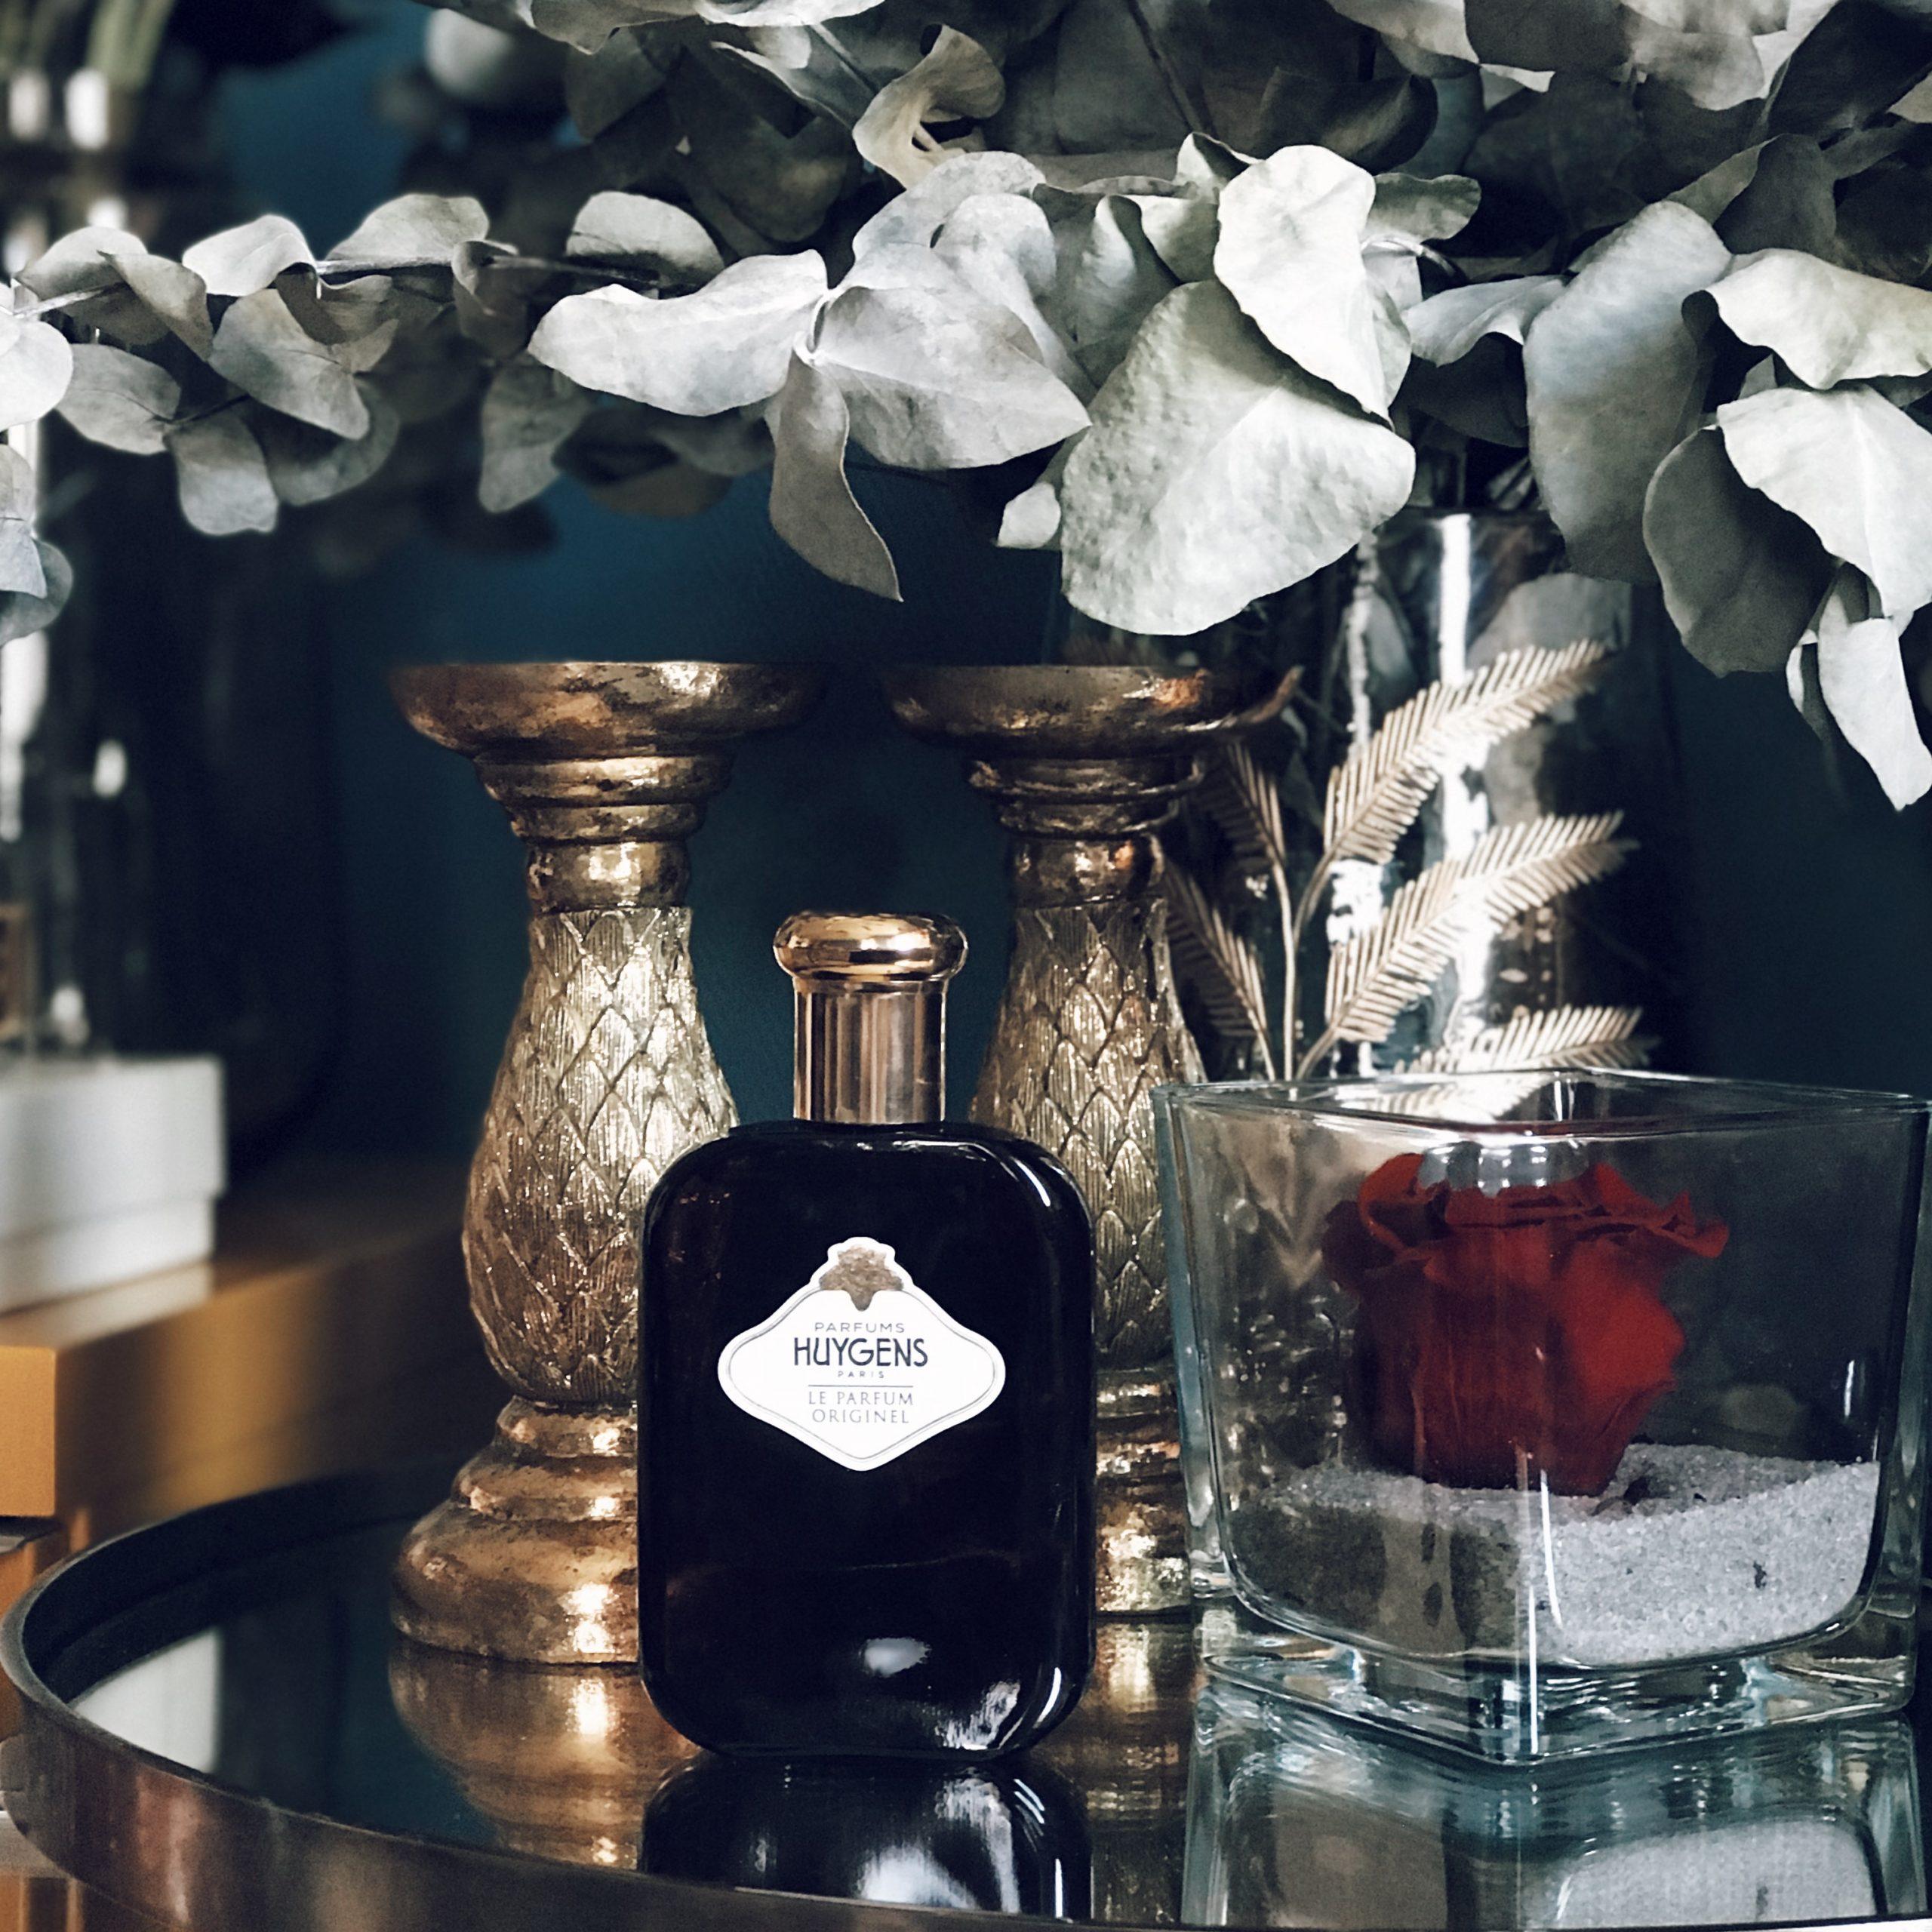 parfum Huygens